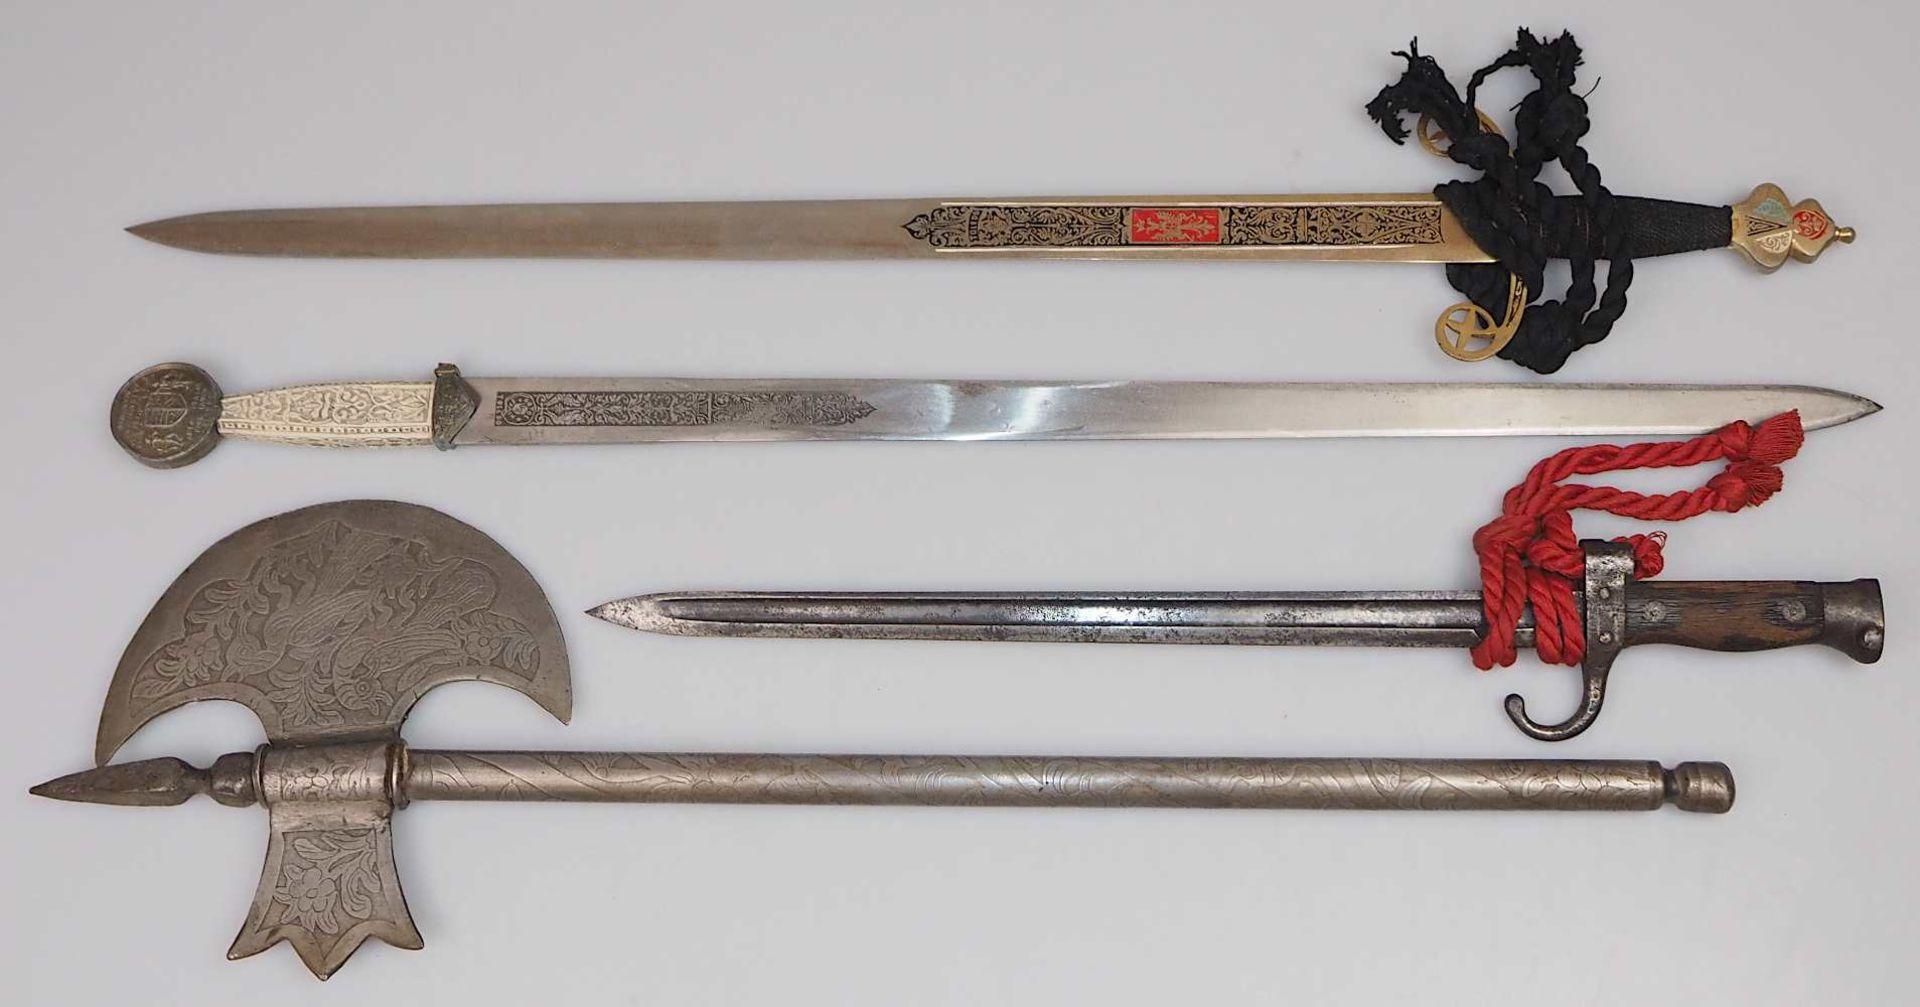 1 Bajonette wohl Anfang 20. Jh. mit Holzgriff L ca. 51,5cm sowie 1 Konv. Waffenreplike